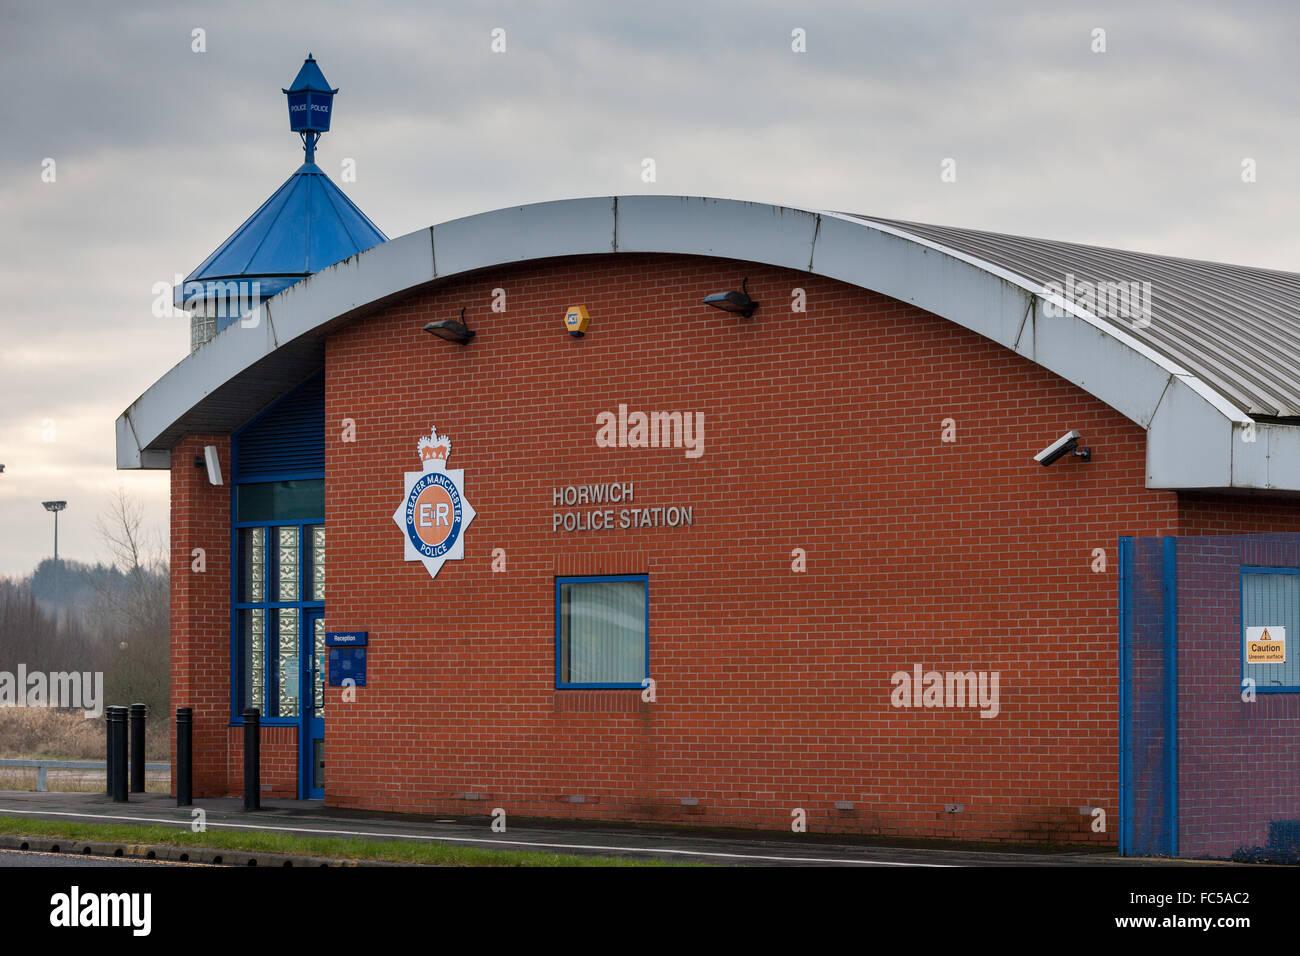 Horwich police station, Bolton, UK - Stock Image